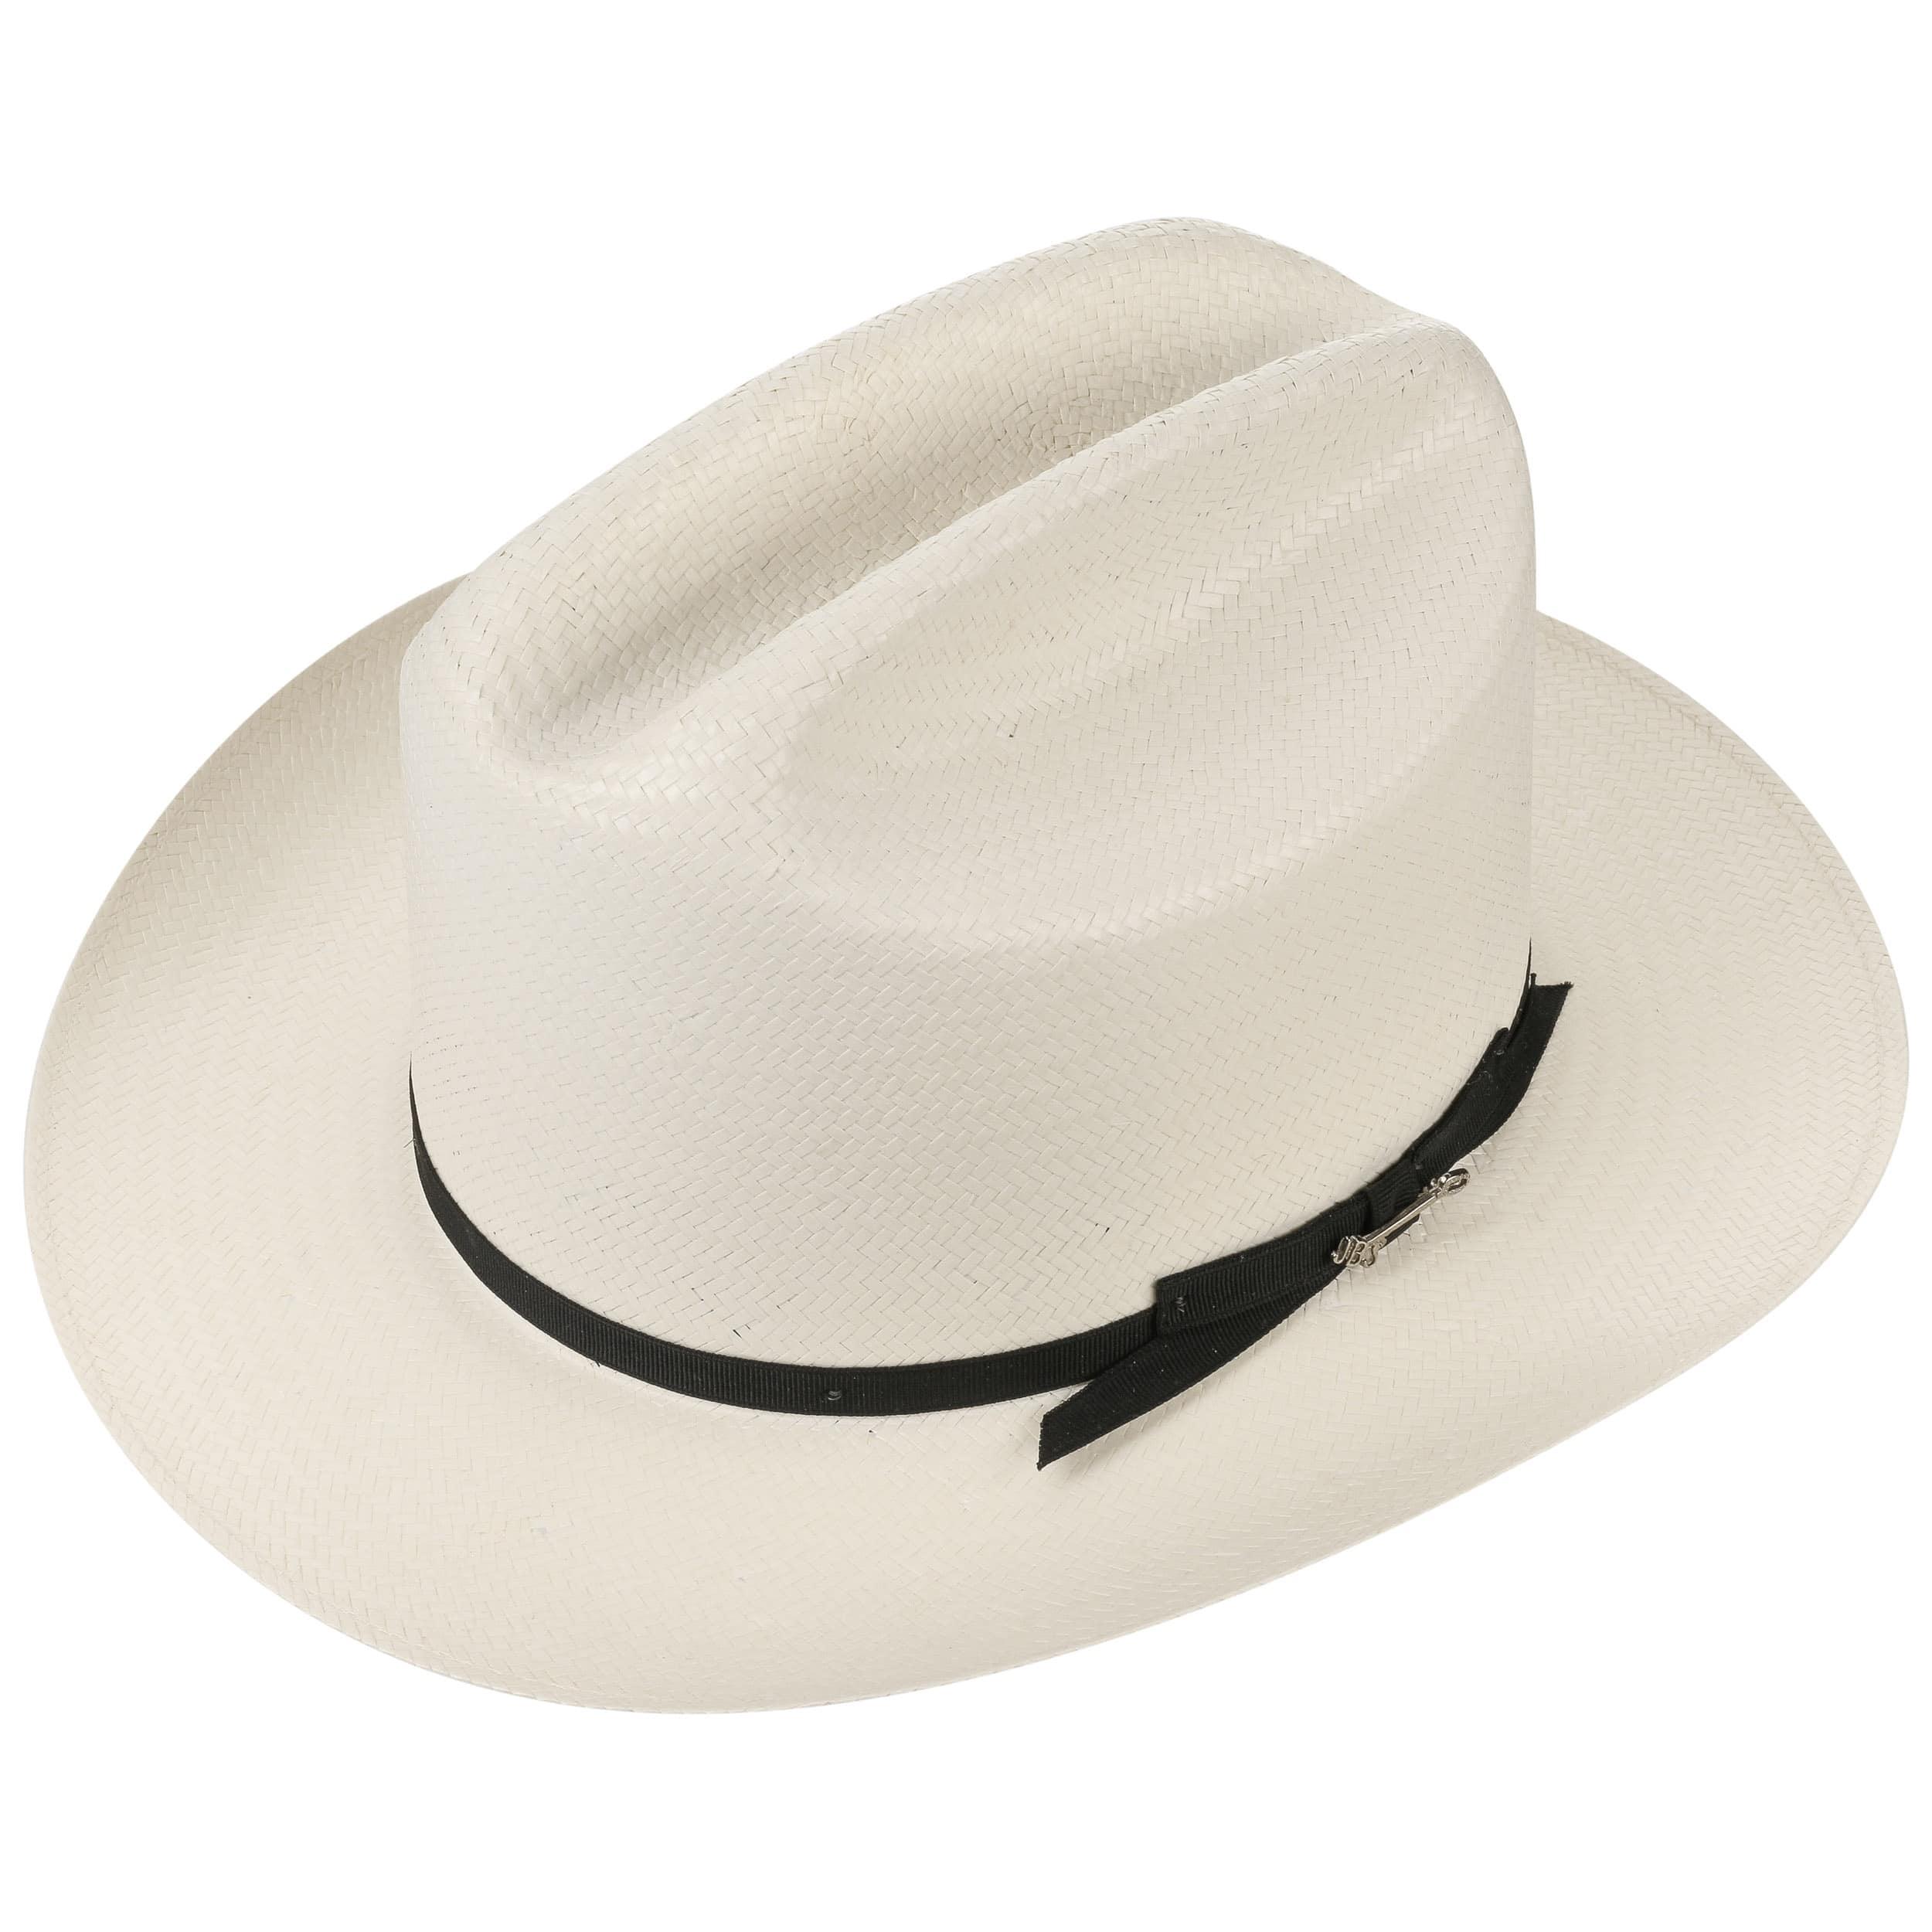 aa15814434 Open Road 6X Western Straw Hat by Stetson - cream white 1 ...